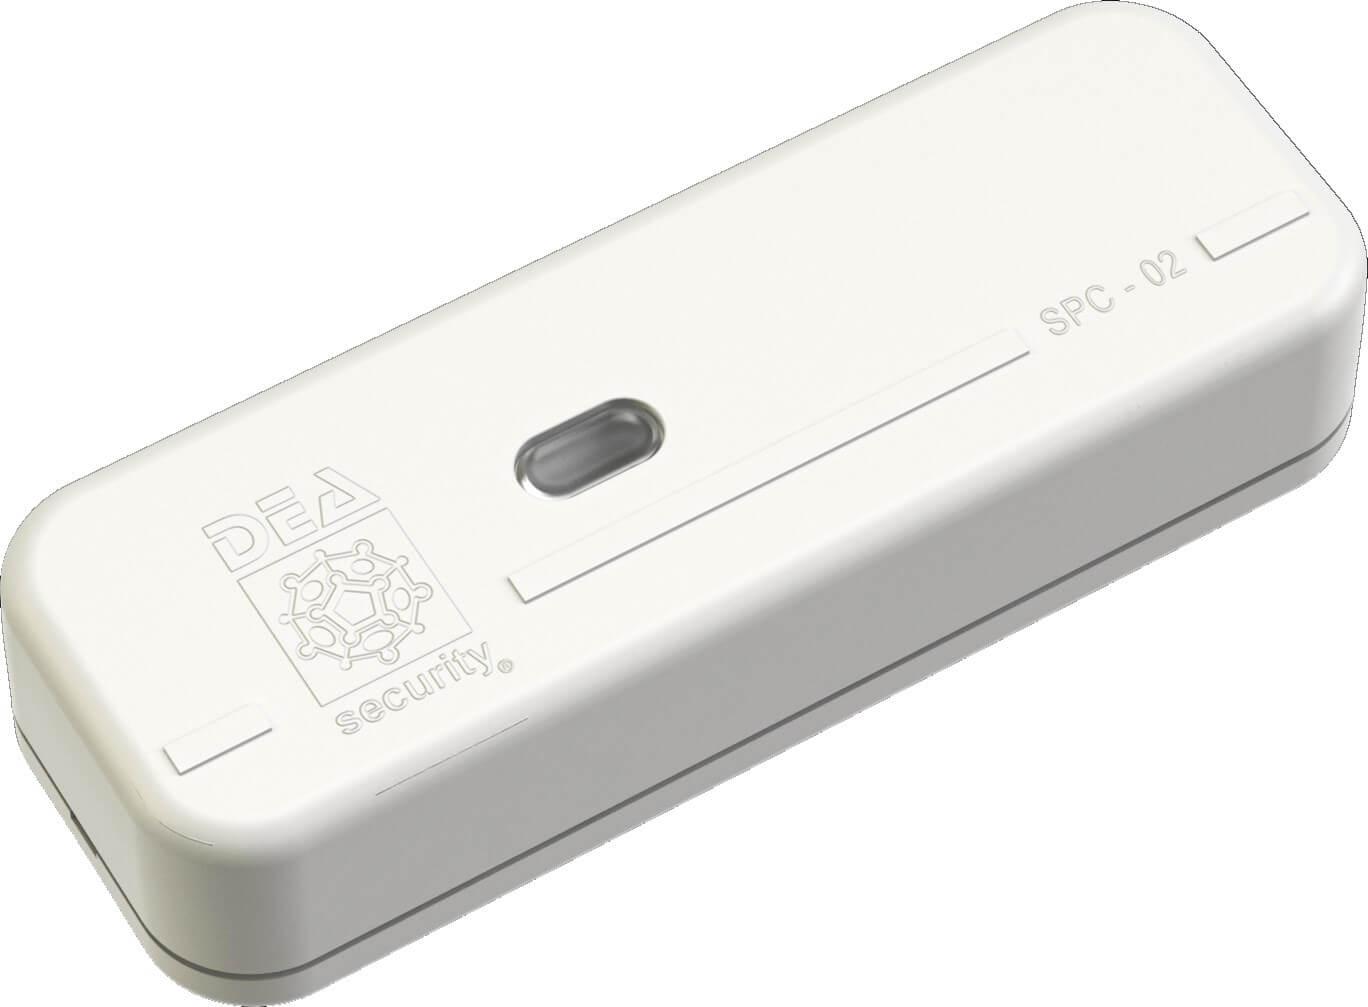 Detector SPC02